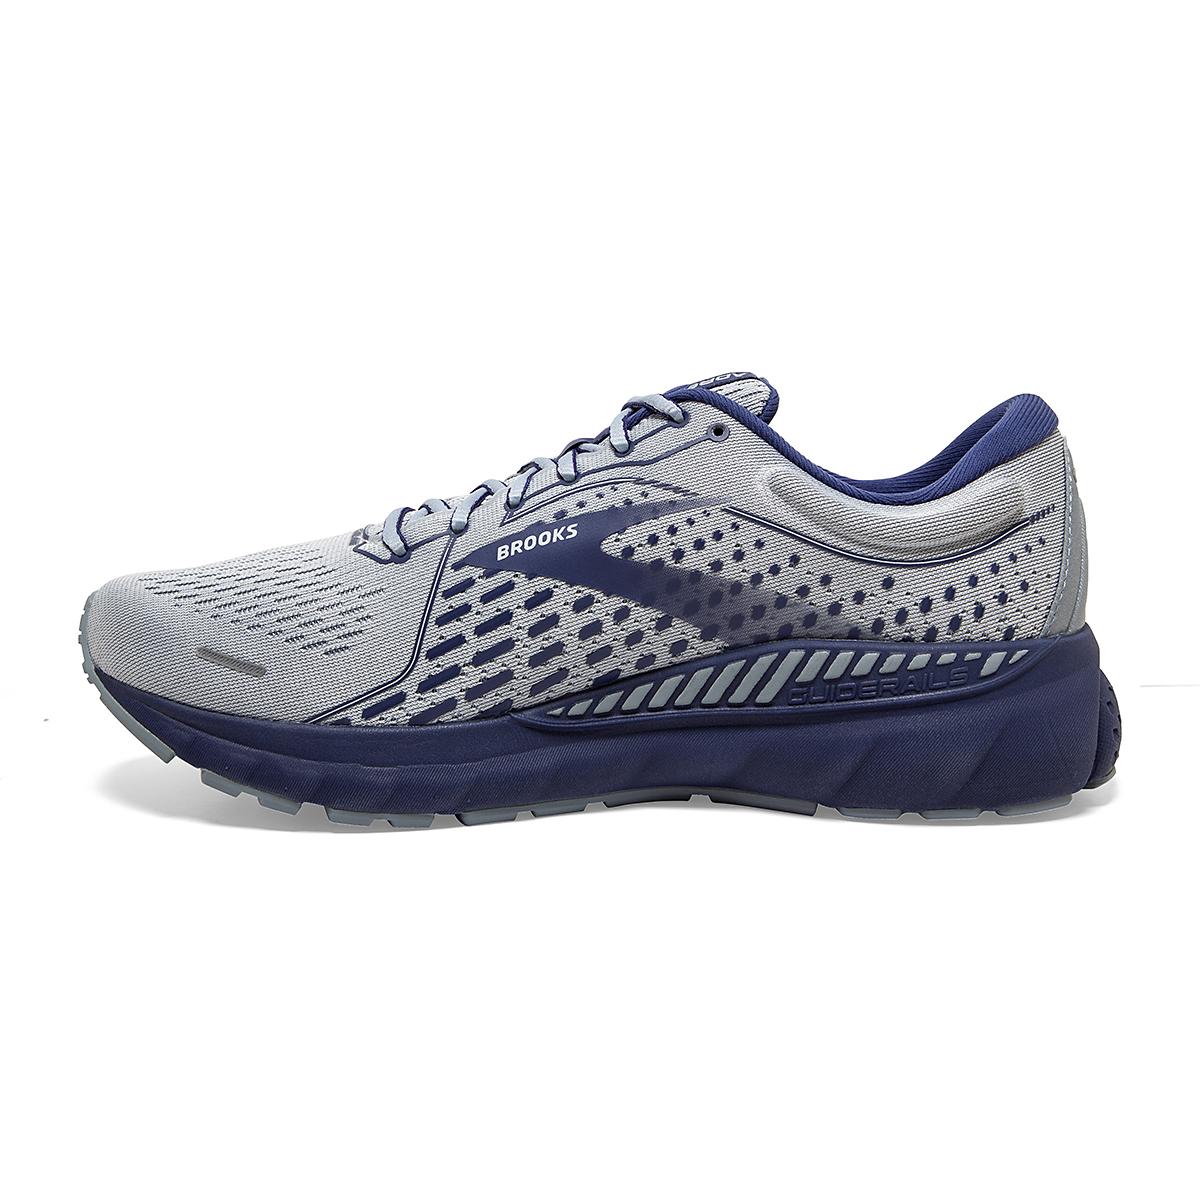 Men's Brooks Adrenaline GTS 21 Running Shoe - Color: Grey/Tradewinds - Size: 7 - Width: Regular, Grey/Tradewinds, large, image 2